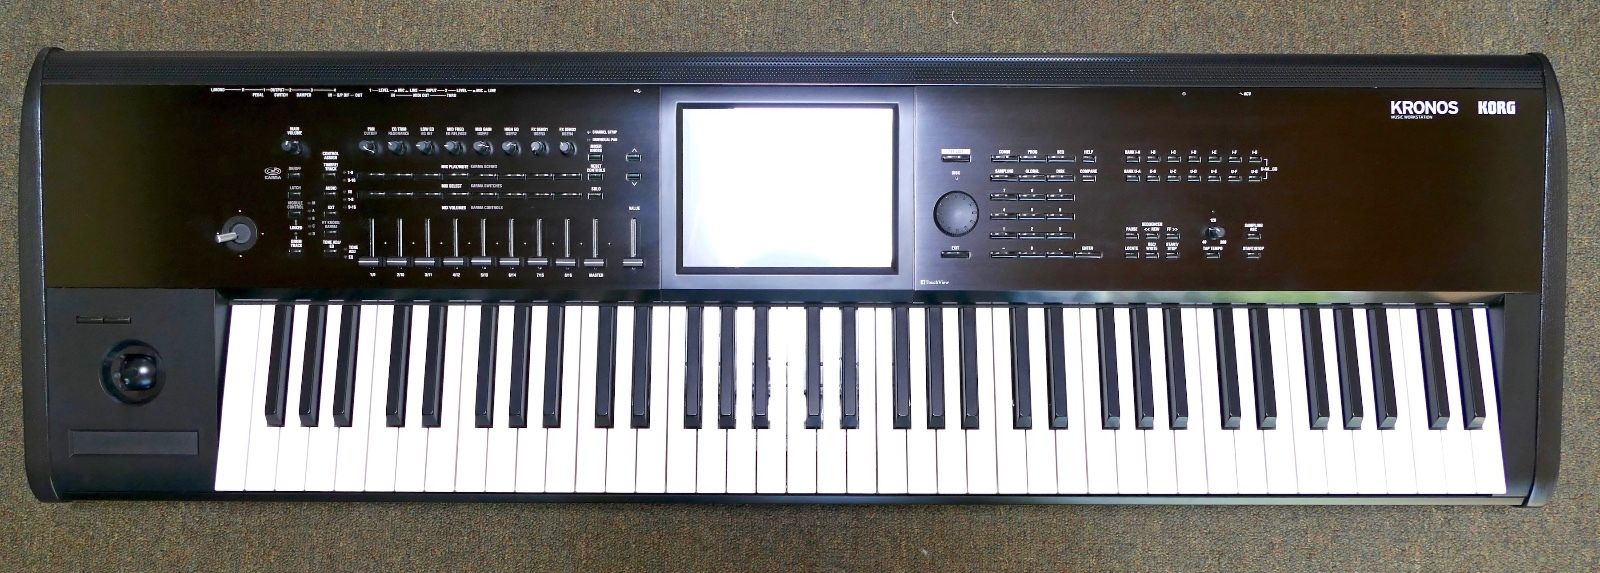 MATRIXSYNTH: Korg Kronos 2 - 73 Key Synthesizer